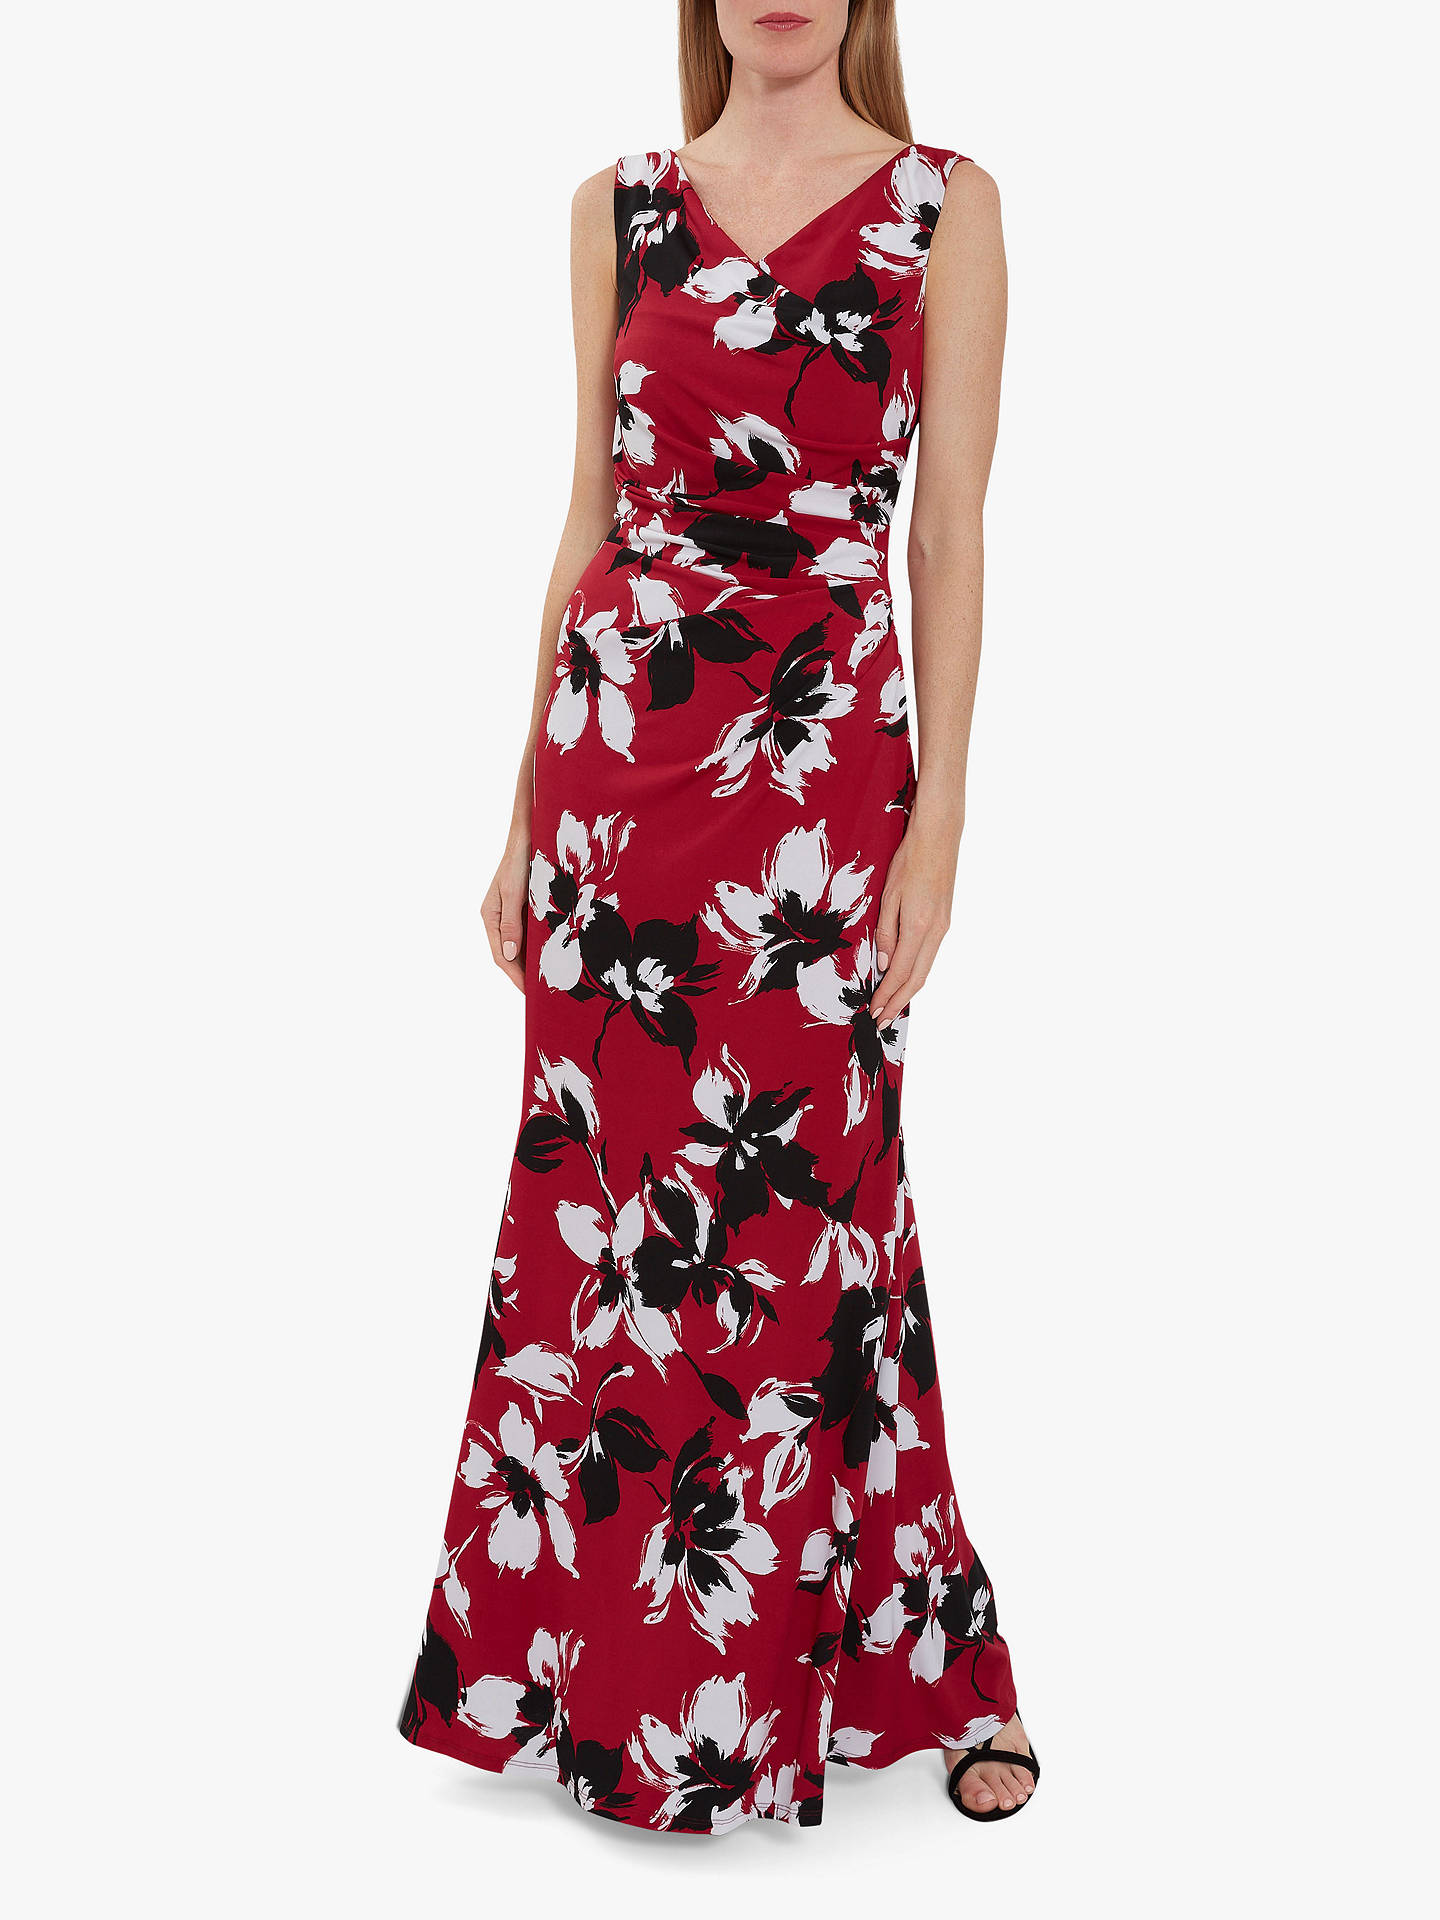 ccf8e00935b4f Gina Bacconi Emaline Floral Maxi Dress, Claret